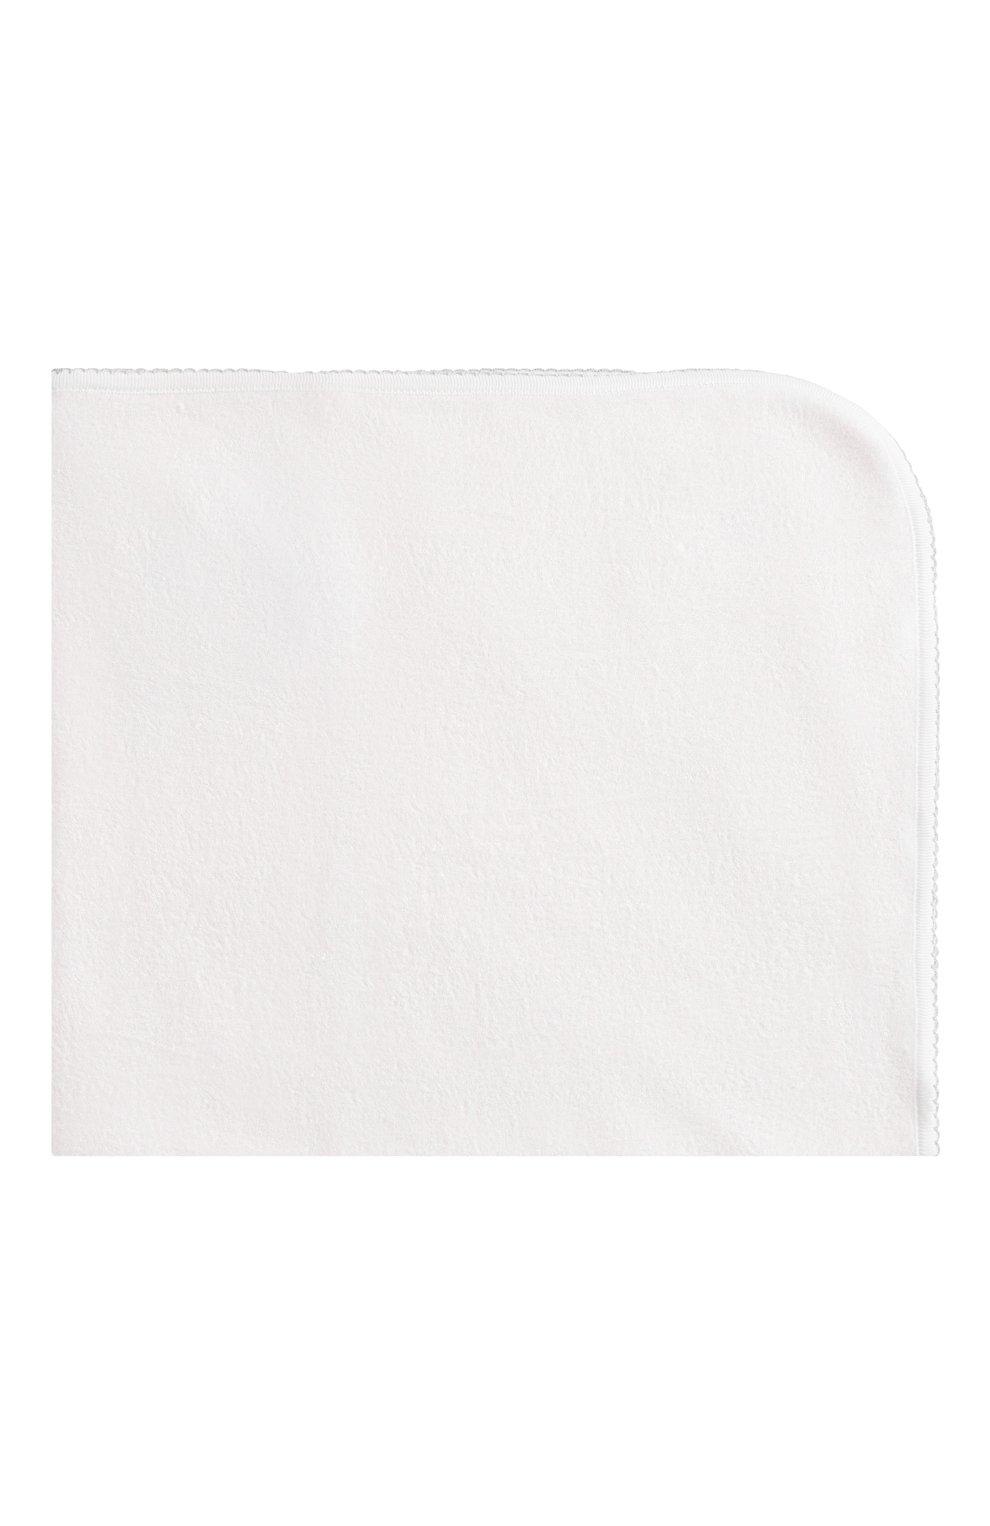 Детского комплект из полотенца и рукавицы KISSY KISSY серого цвета, арт. 48609 | Фото 3 (Материал: Текстиль, Хлопок)